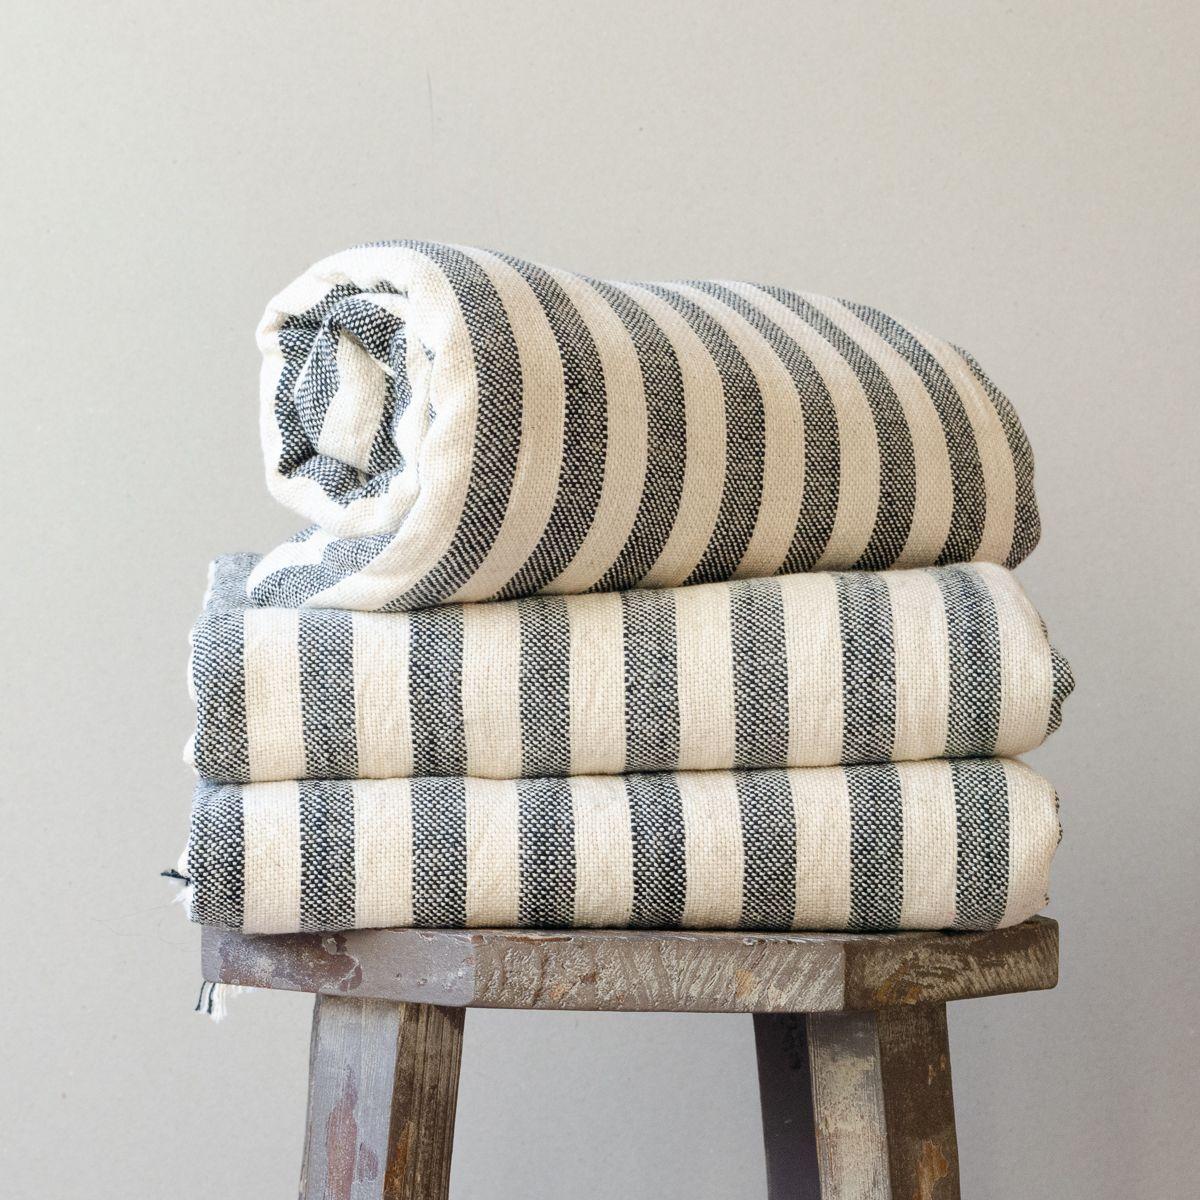 Nora Linen Towel With Images Linen Towels Turkish Towels Towel